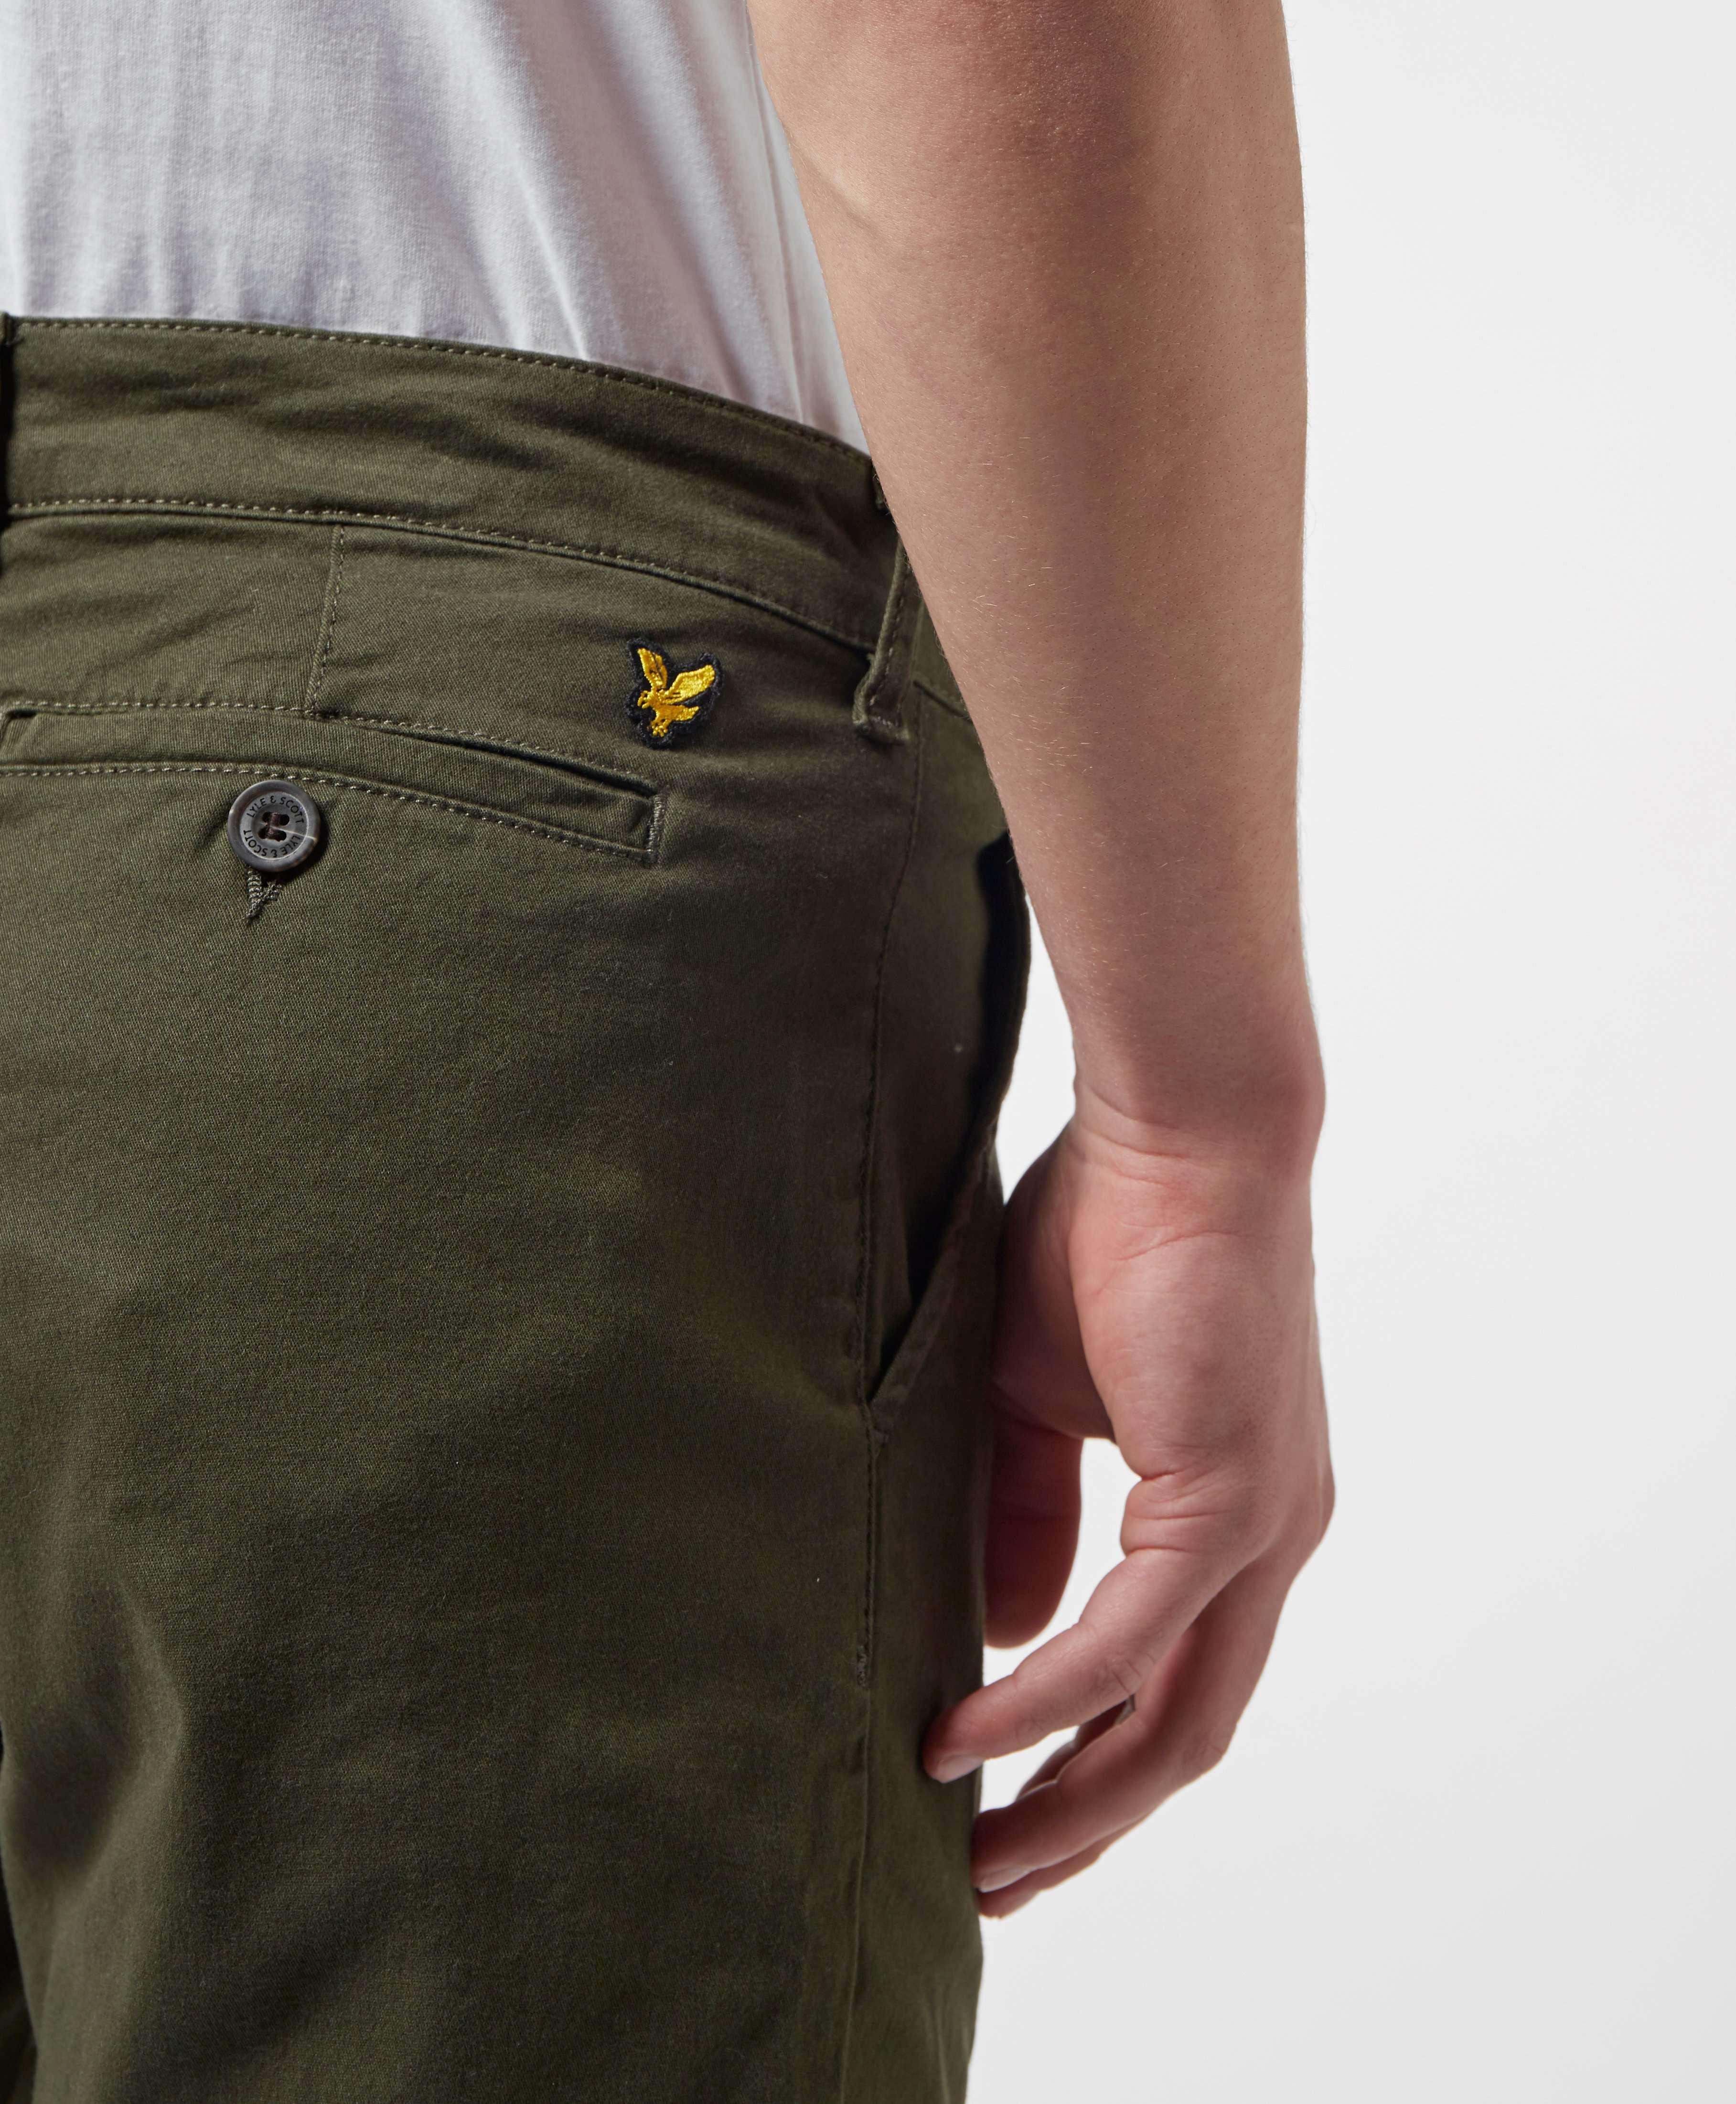 Lyle & Scott Chino Shorts - Exclusive